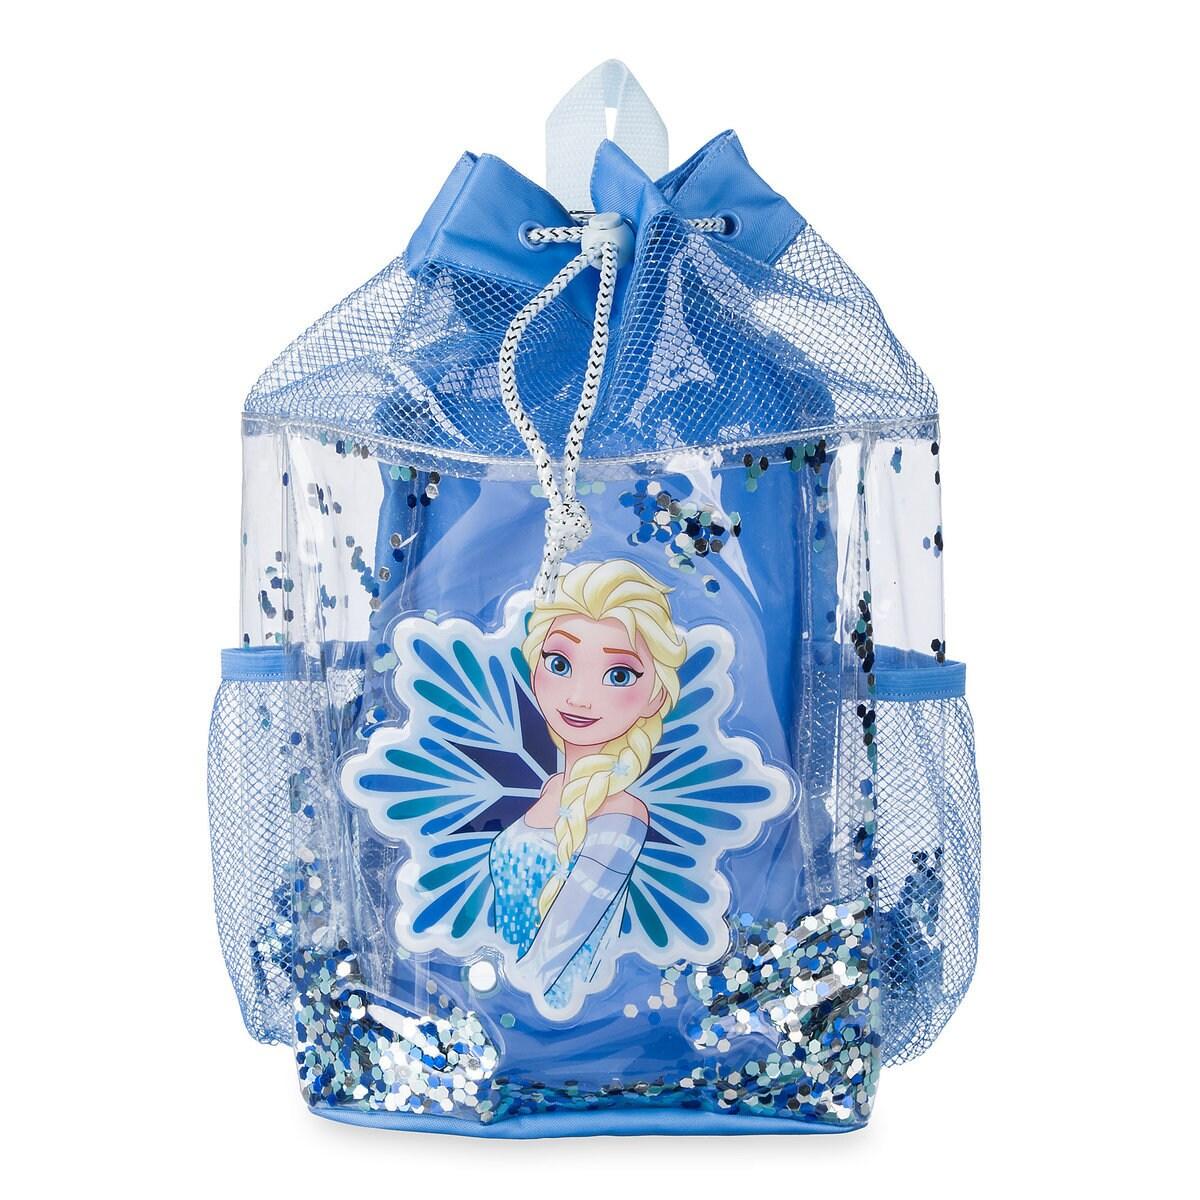 66bab7ffc123c Product Image of Elsa Swim Bag - Frozen # 1